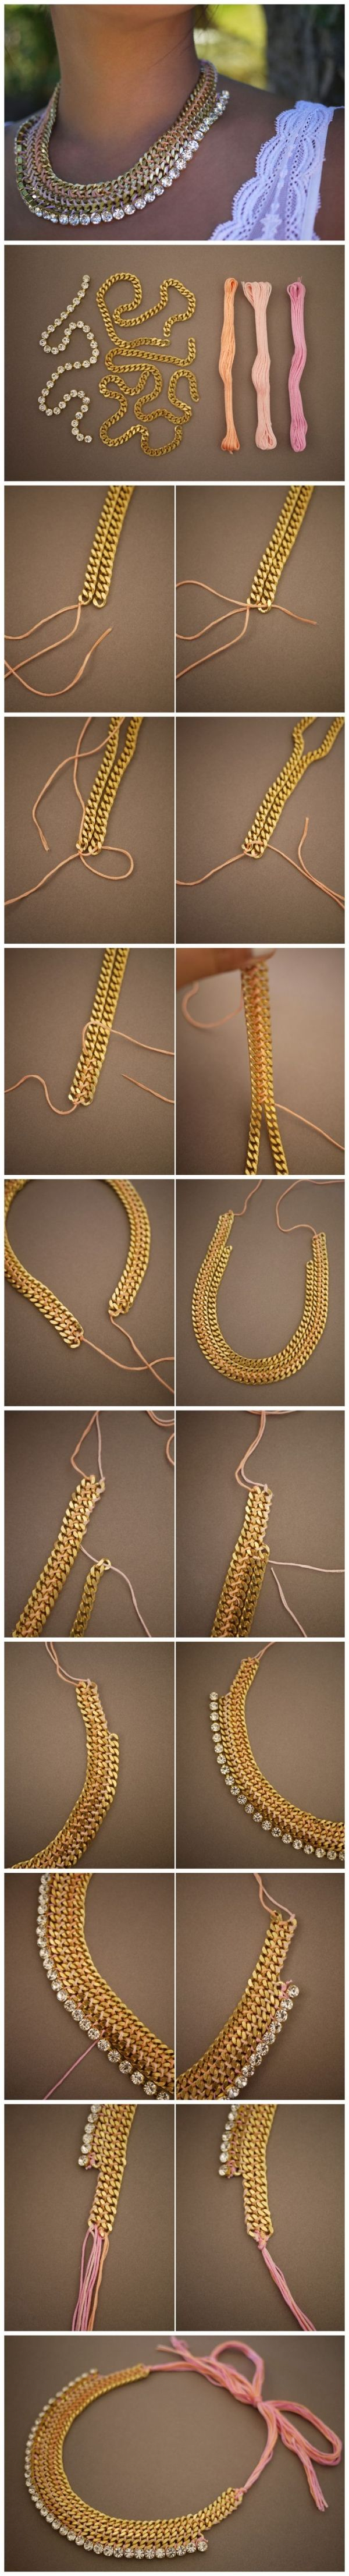 DIY necklace by anusha.annam.9